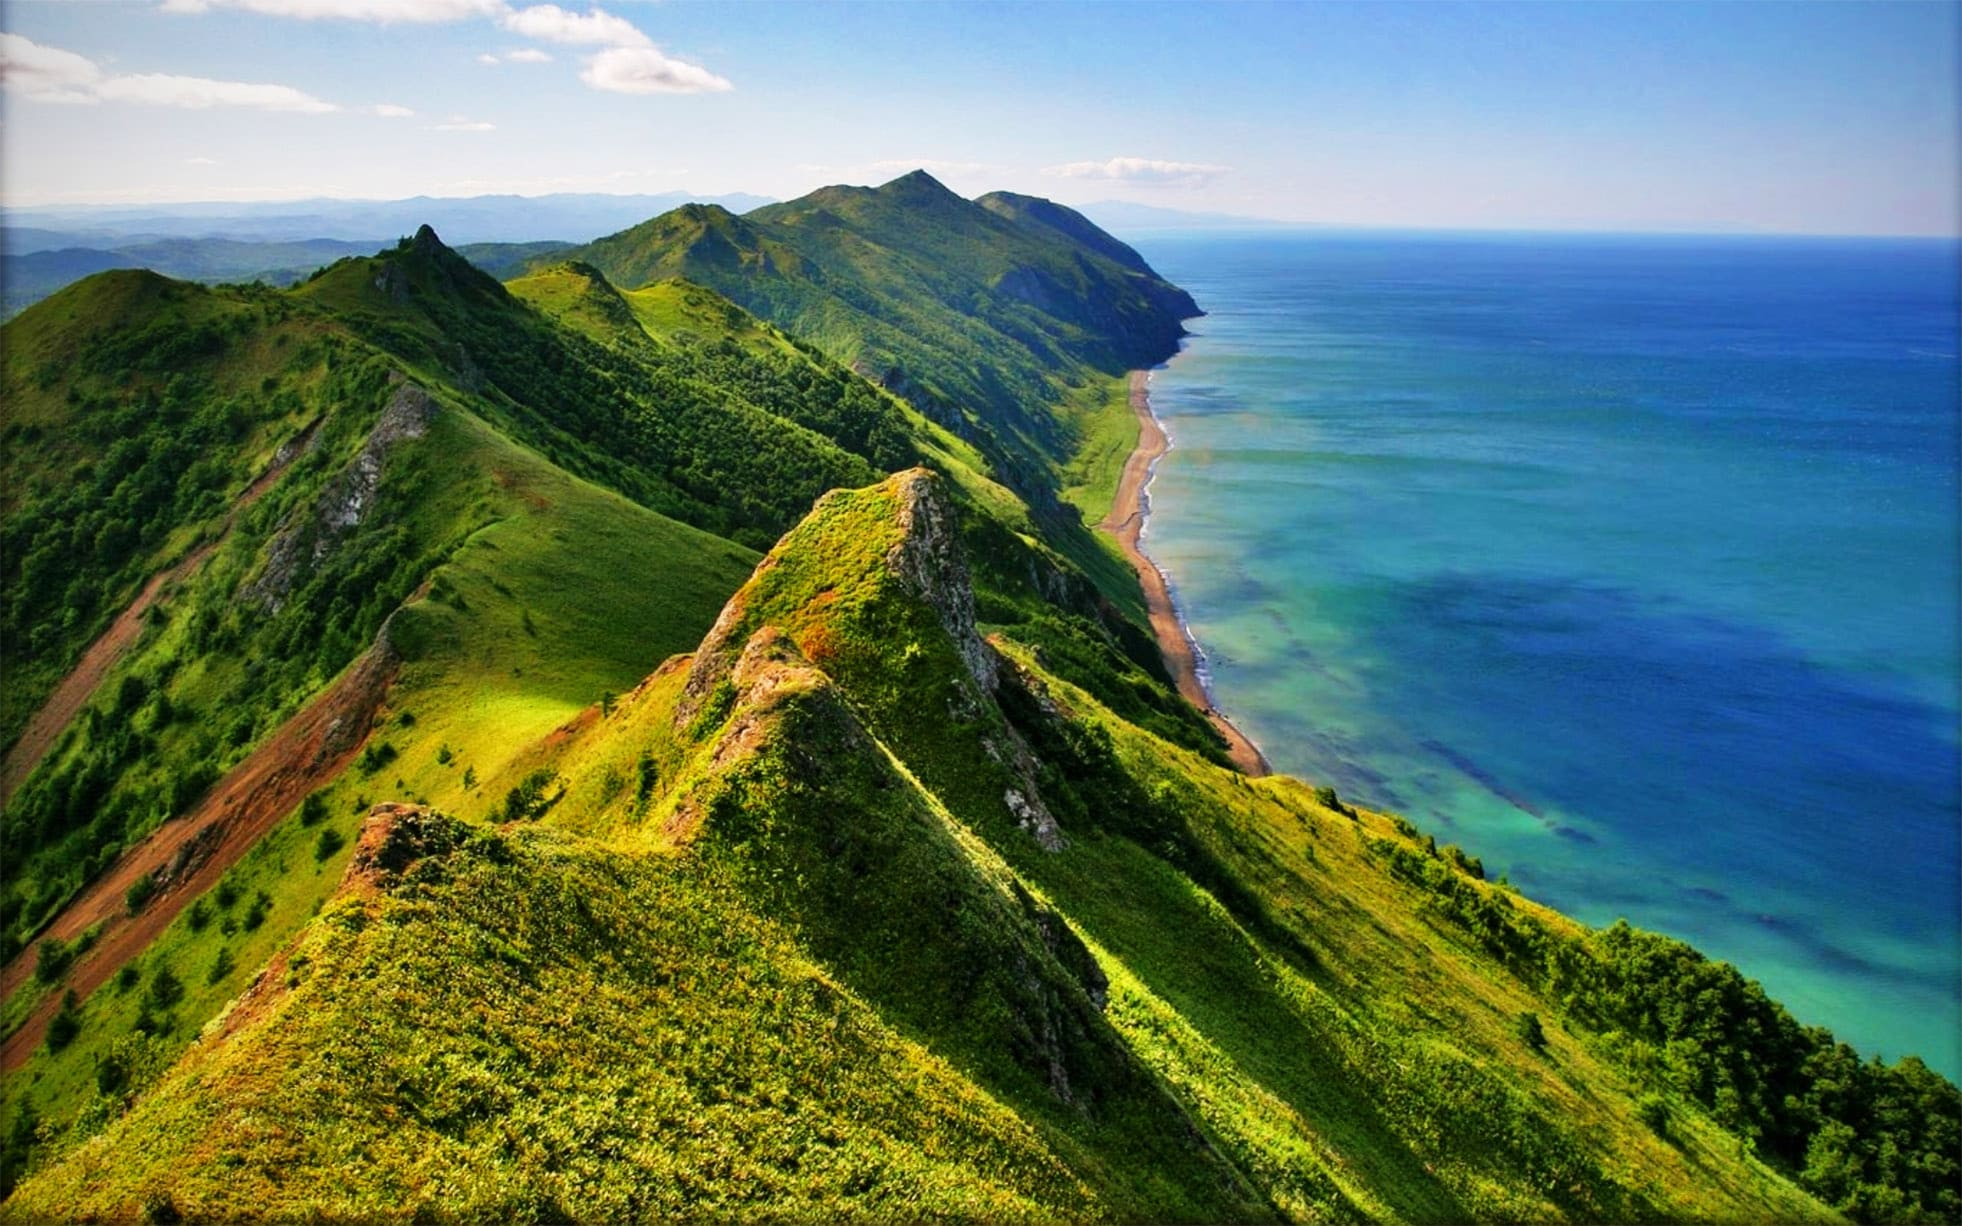 Береговая линия острова Сахалин